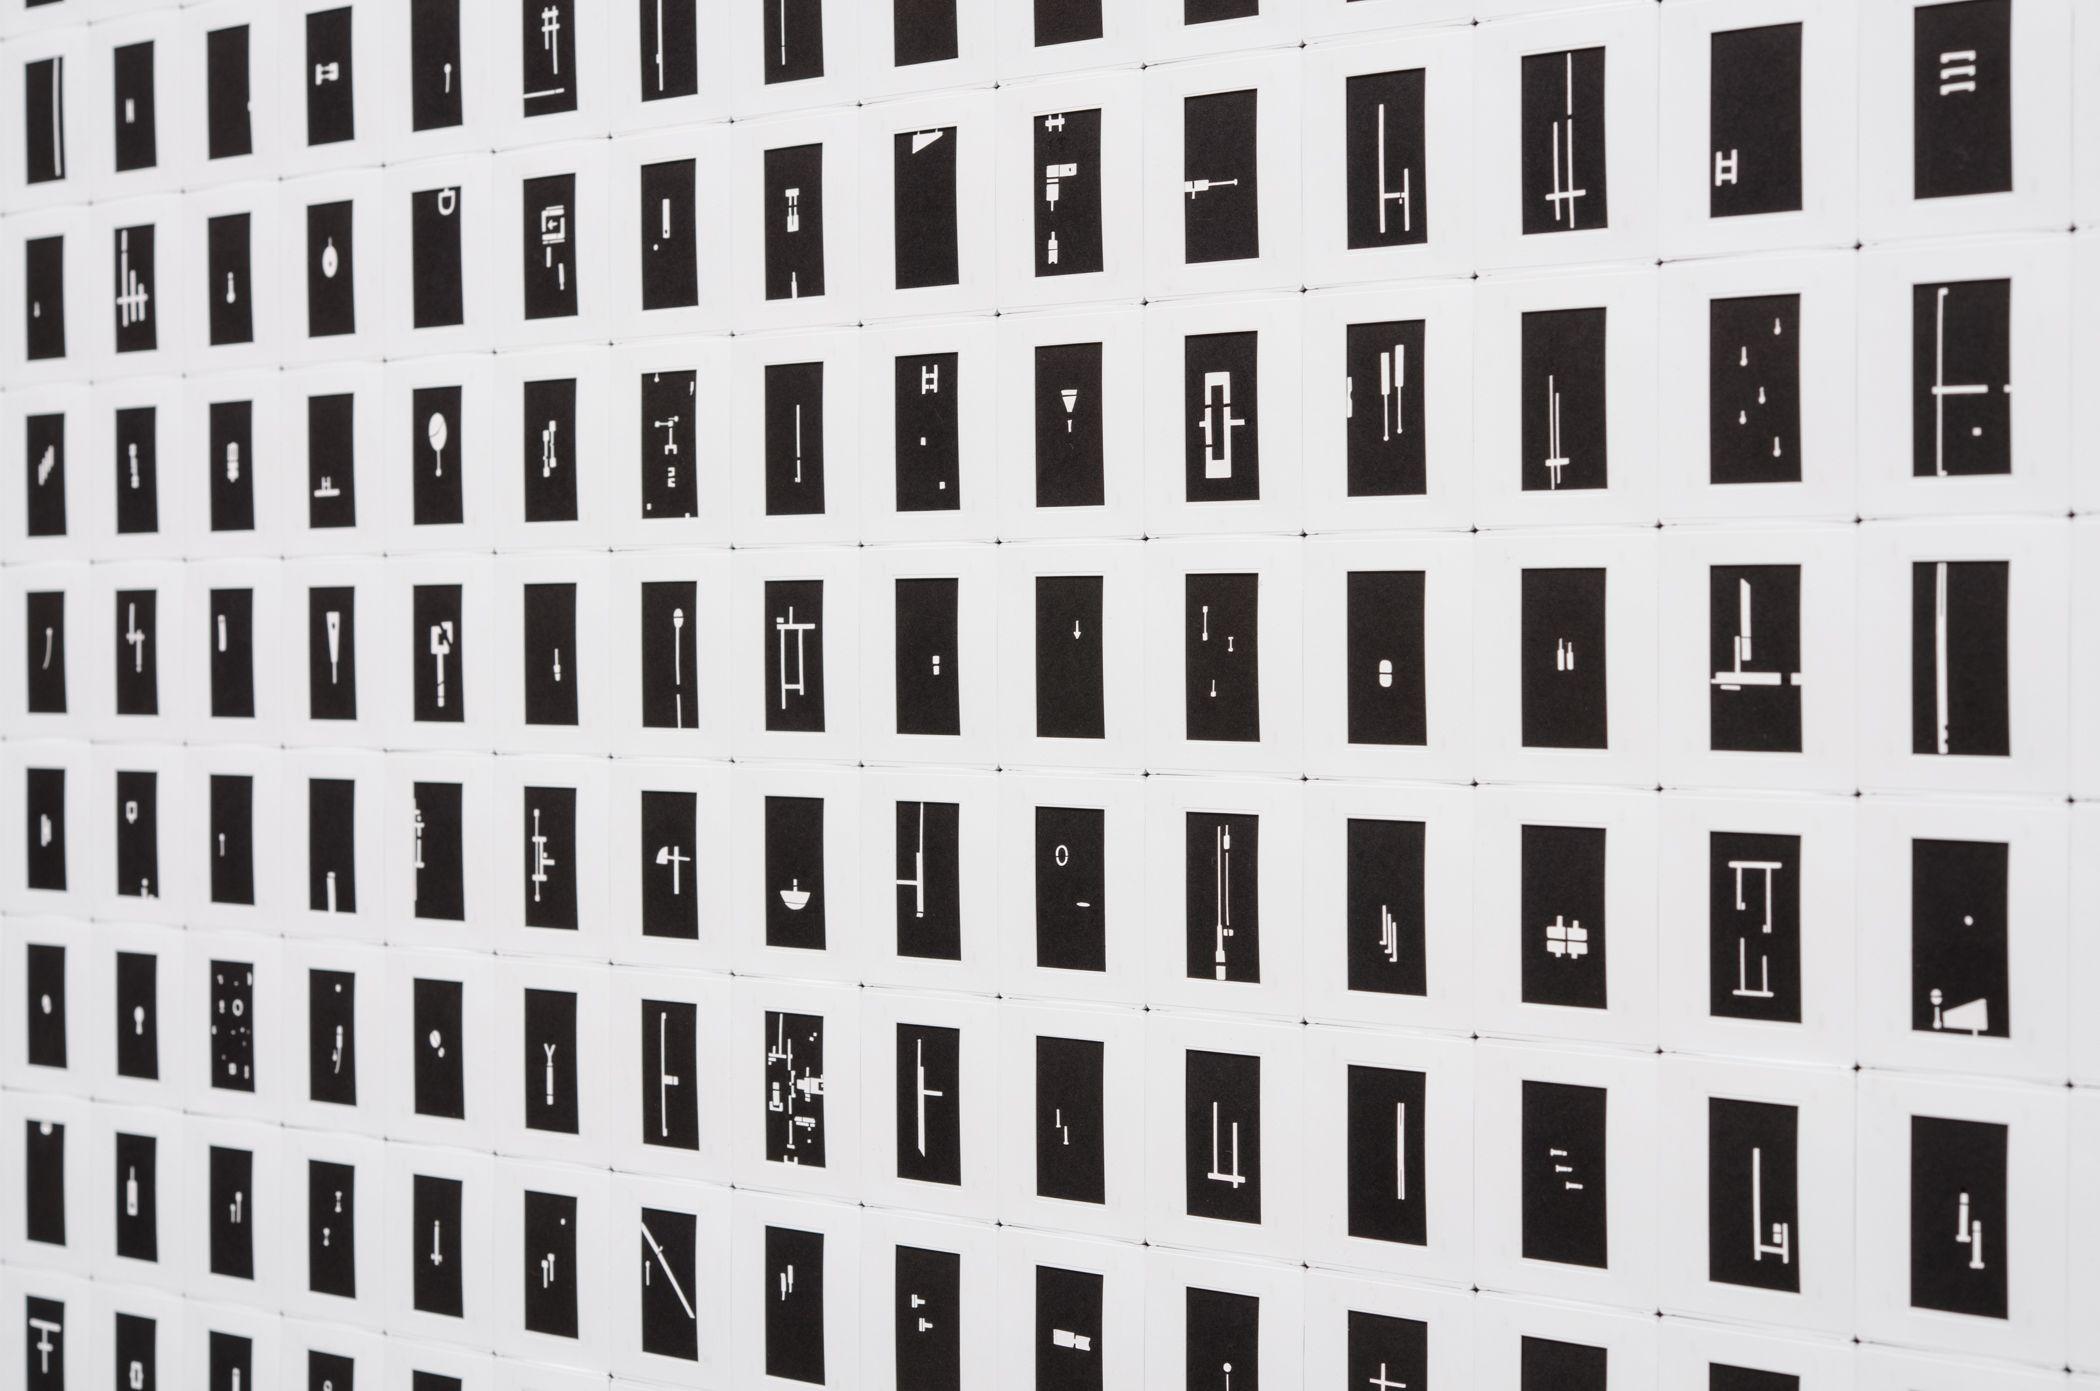 Marco Maggi, Optimismo Radical (negro) (detalle), 2016. Foto: Walter Otto. Cortesía: Espacio Monitor